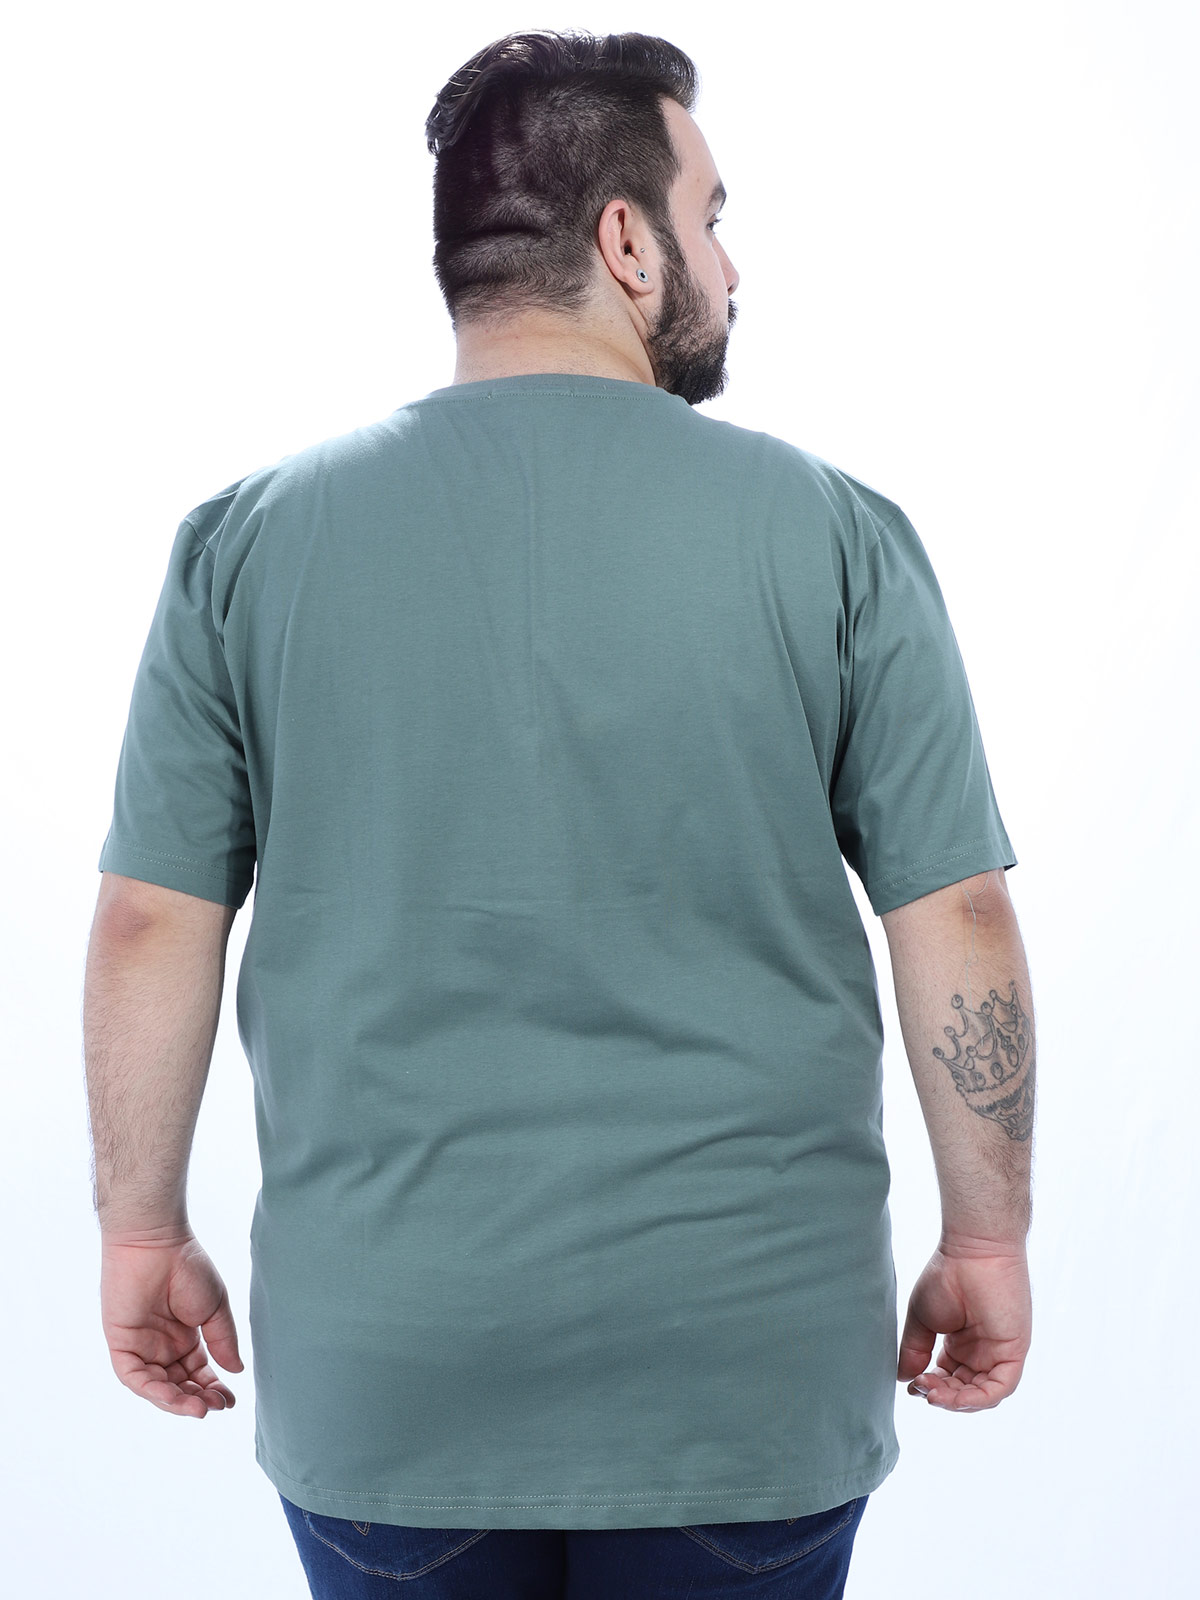 Camiseta Plus Size Masculino Jeep Anistia Concreto